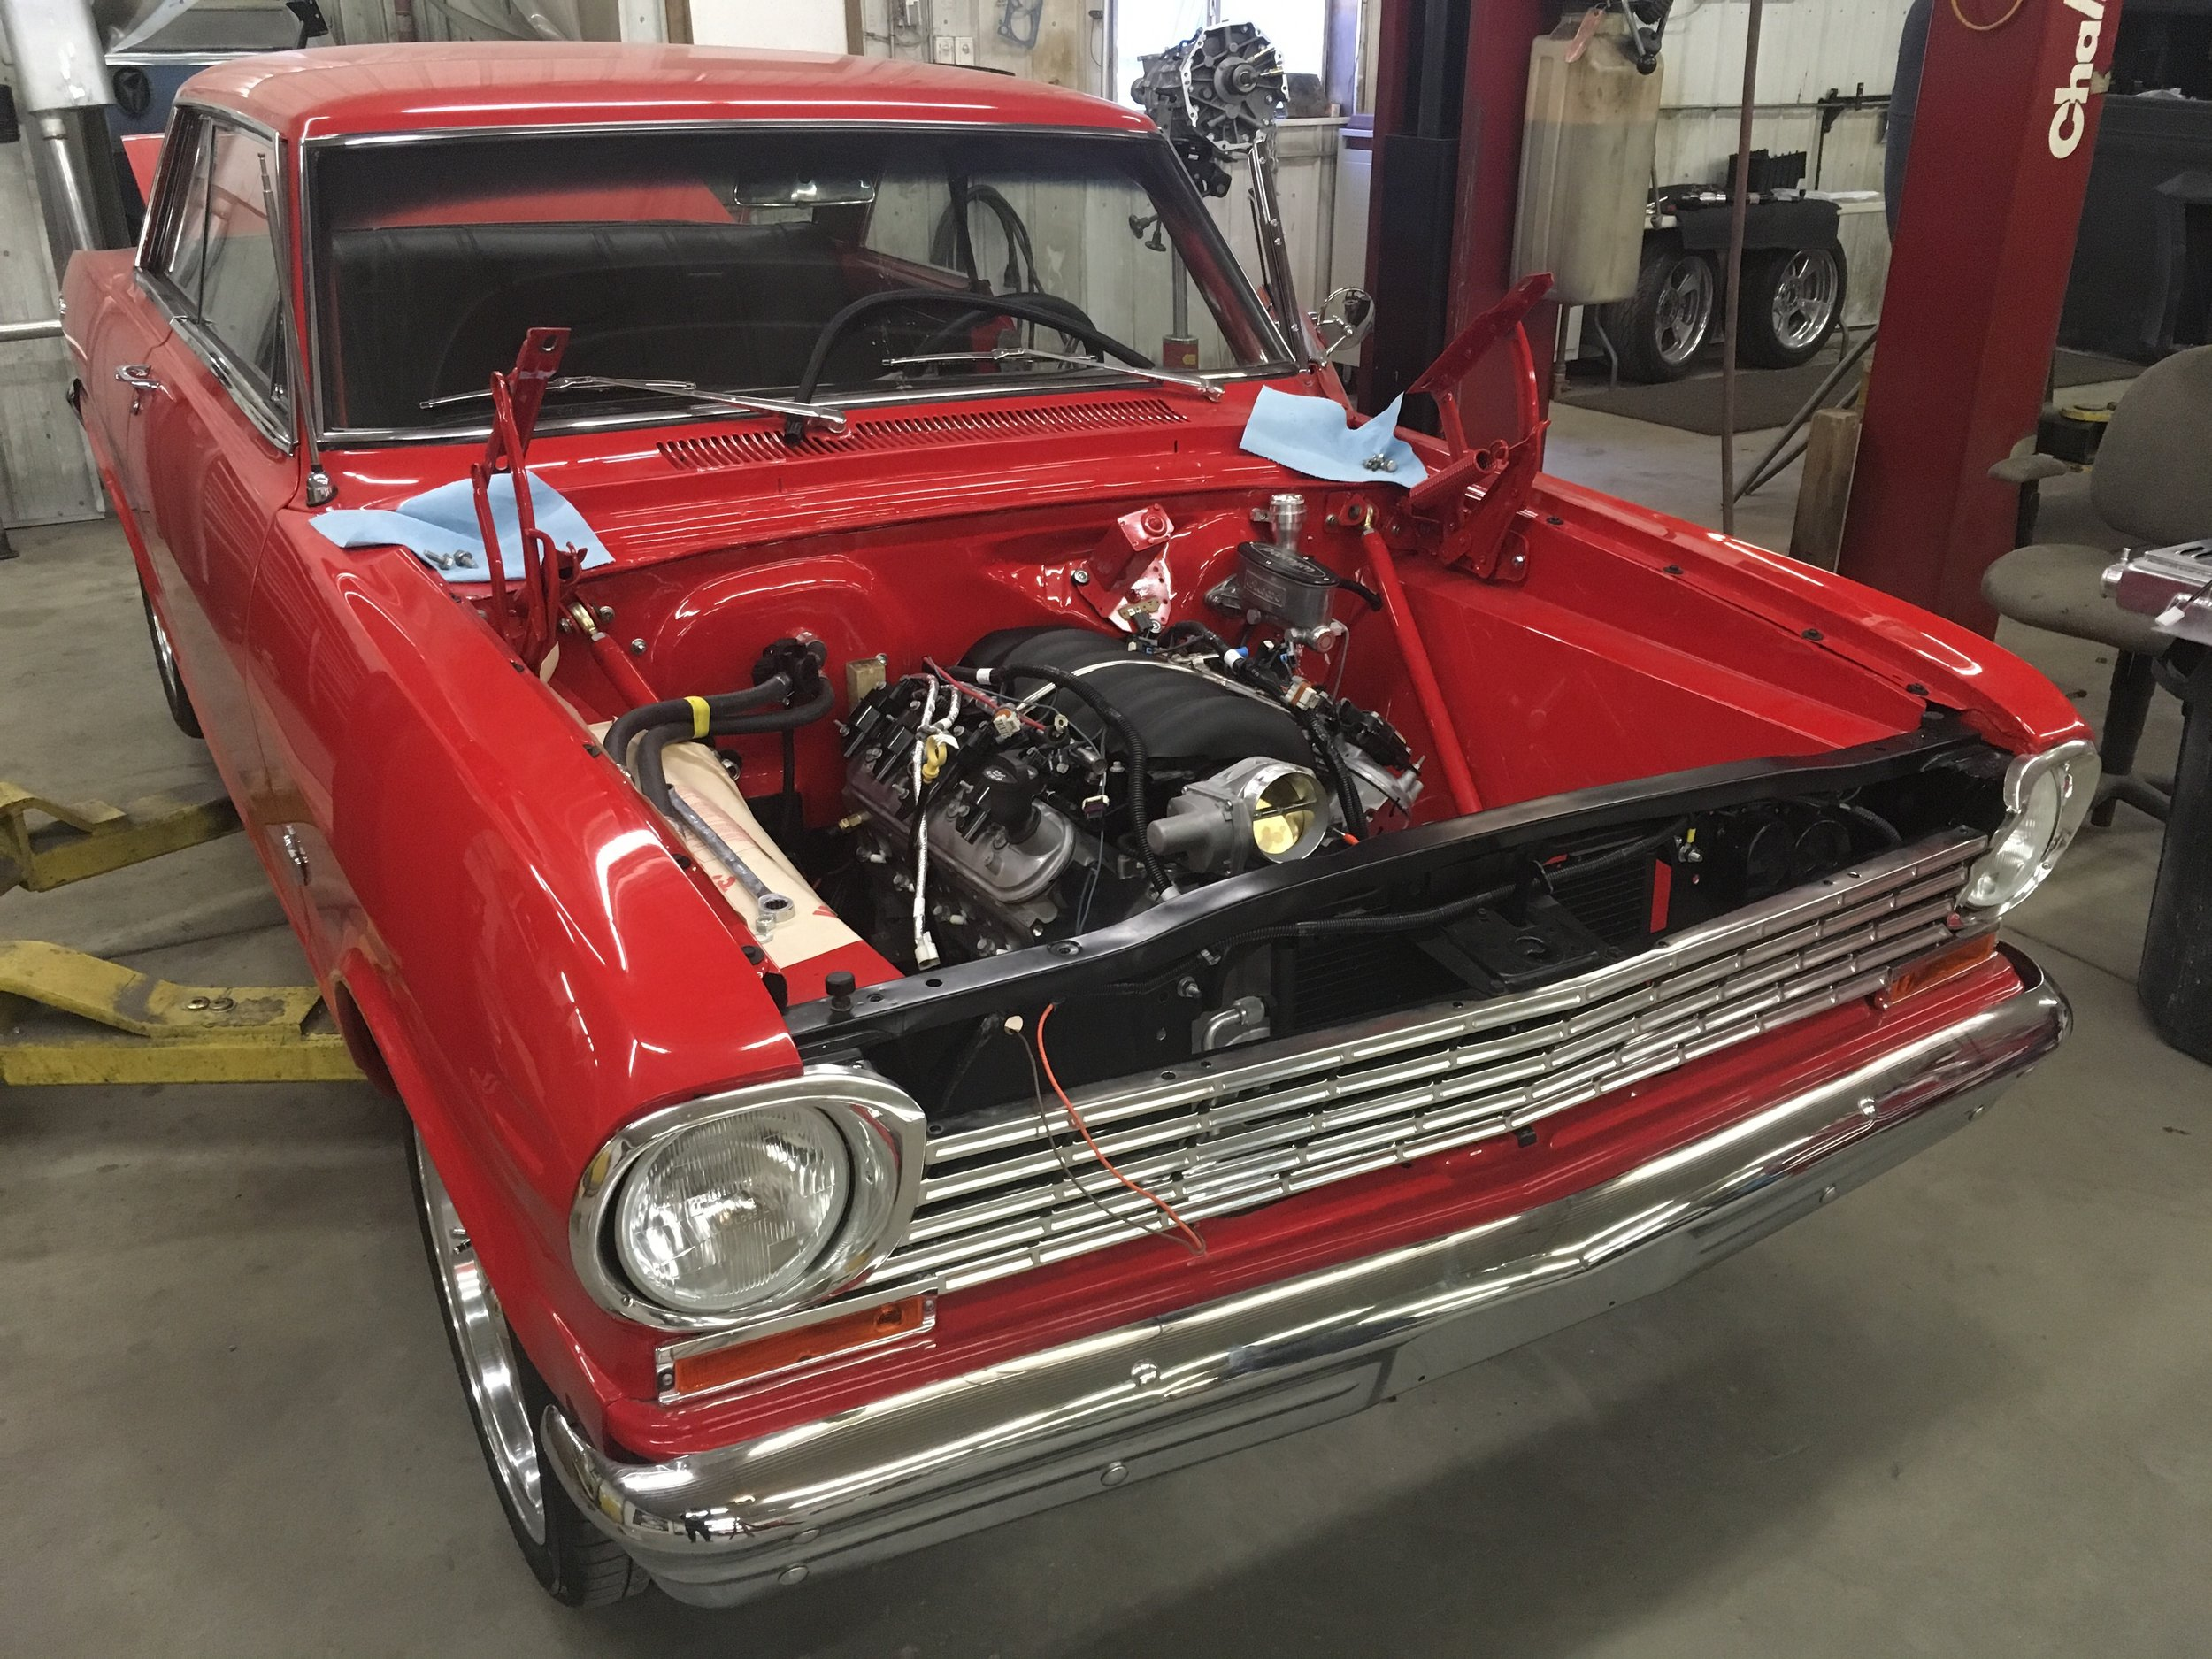 minneapolis-hot-rod-restoration-65-nova-engine-hot-rod-factory.jpg